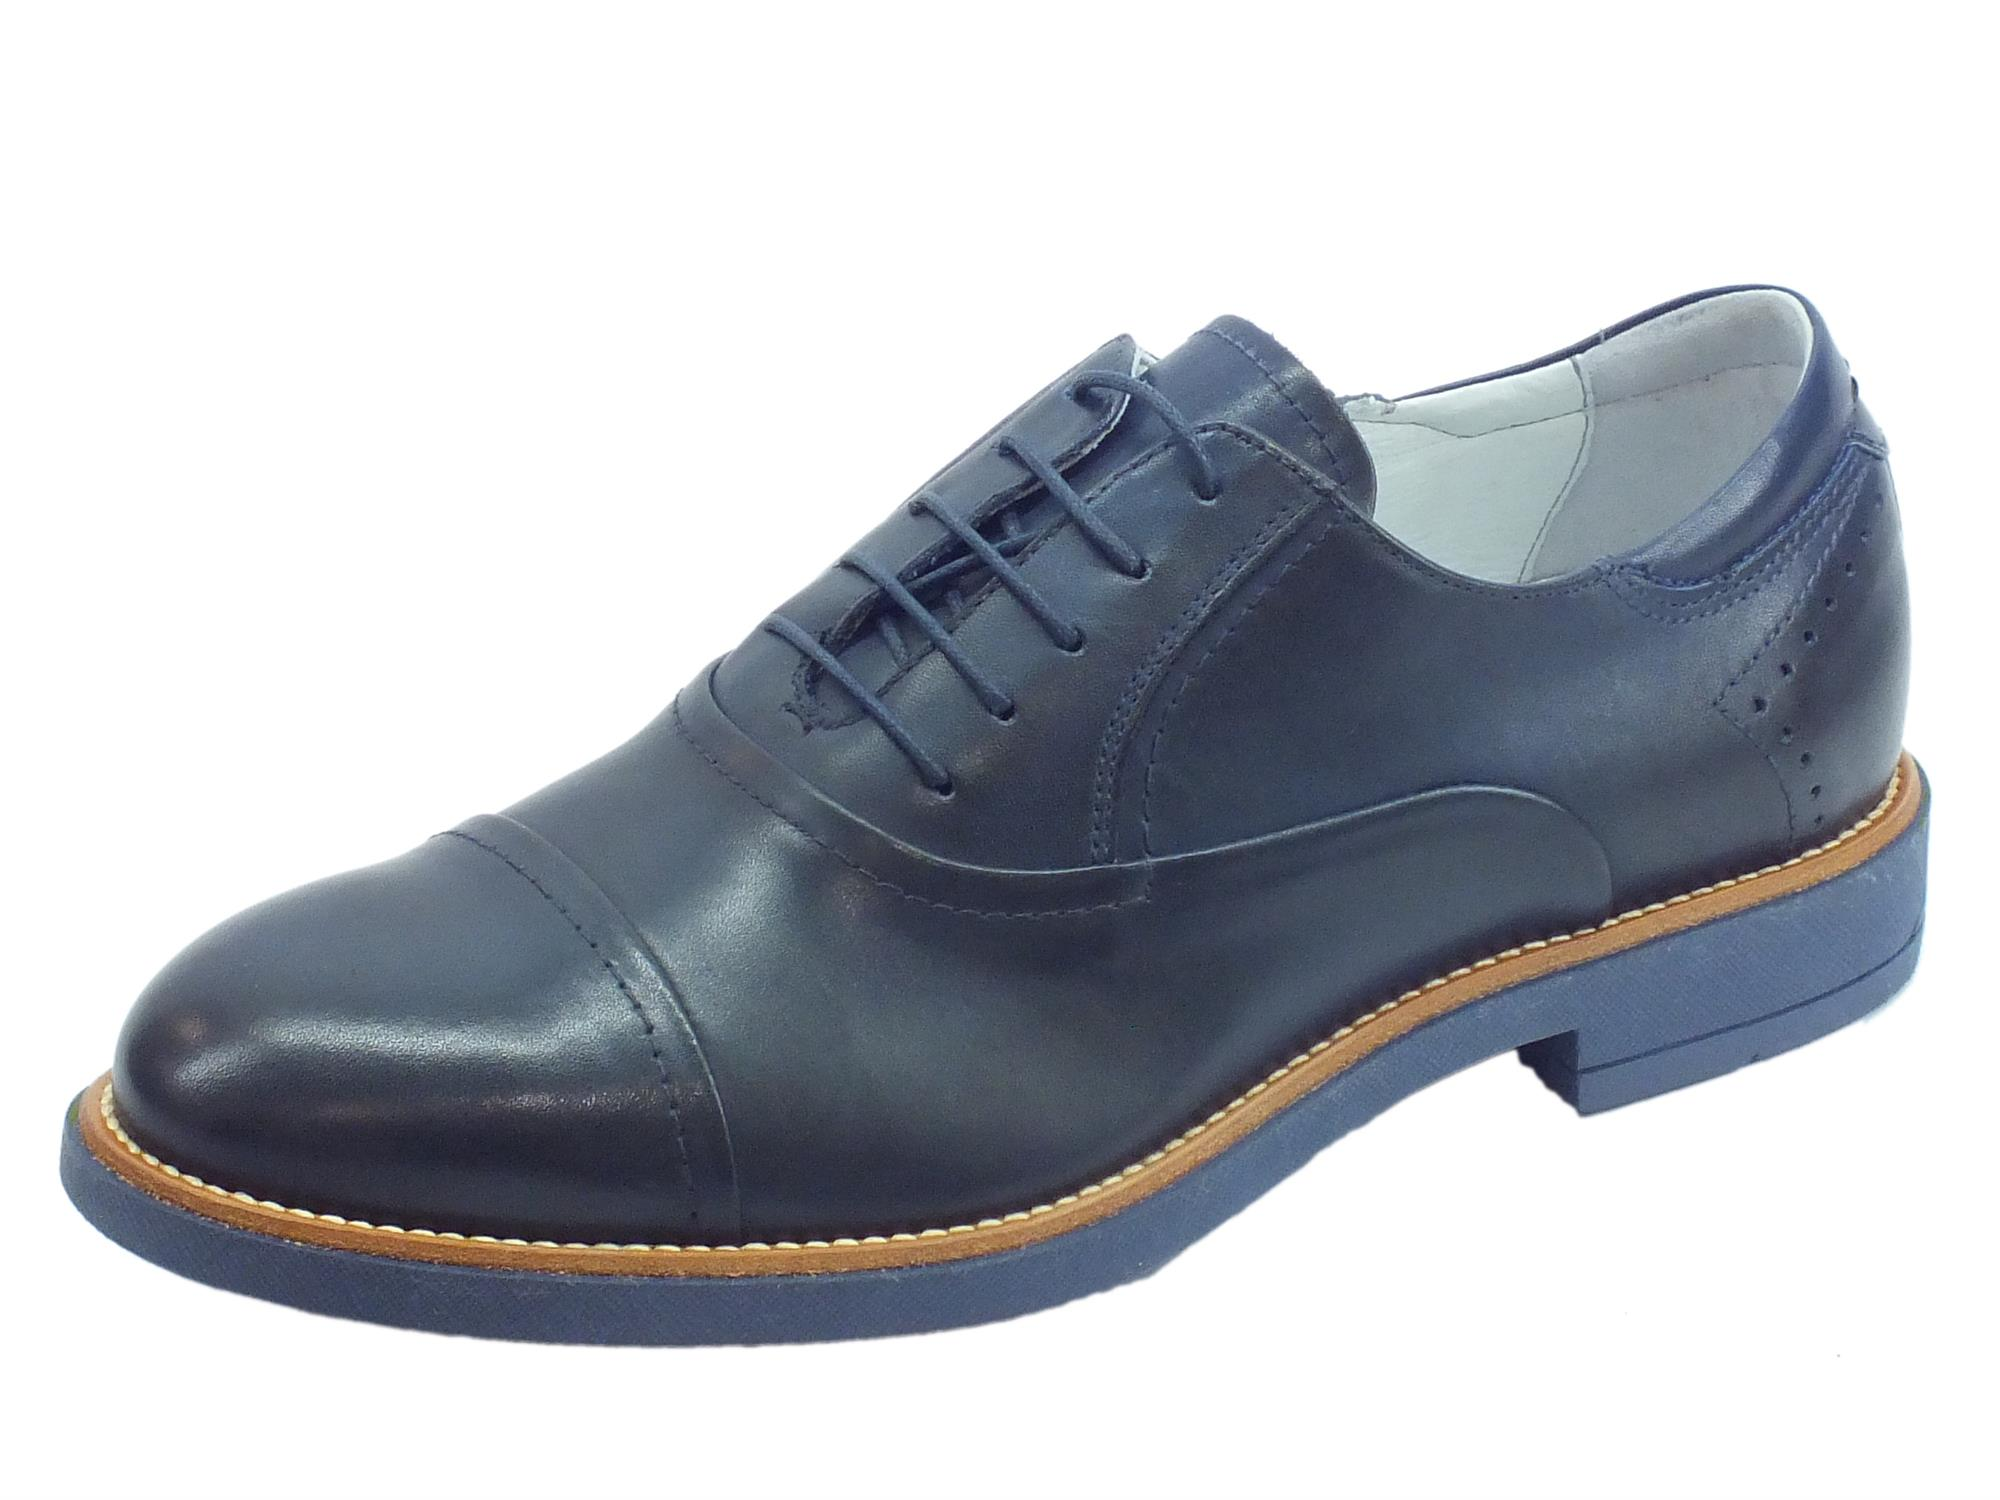 best sneakers 3017c 9959f Scarpe eleganti NeroGiardini per uomo in pelle blu fodera e sottopiede in  pelle